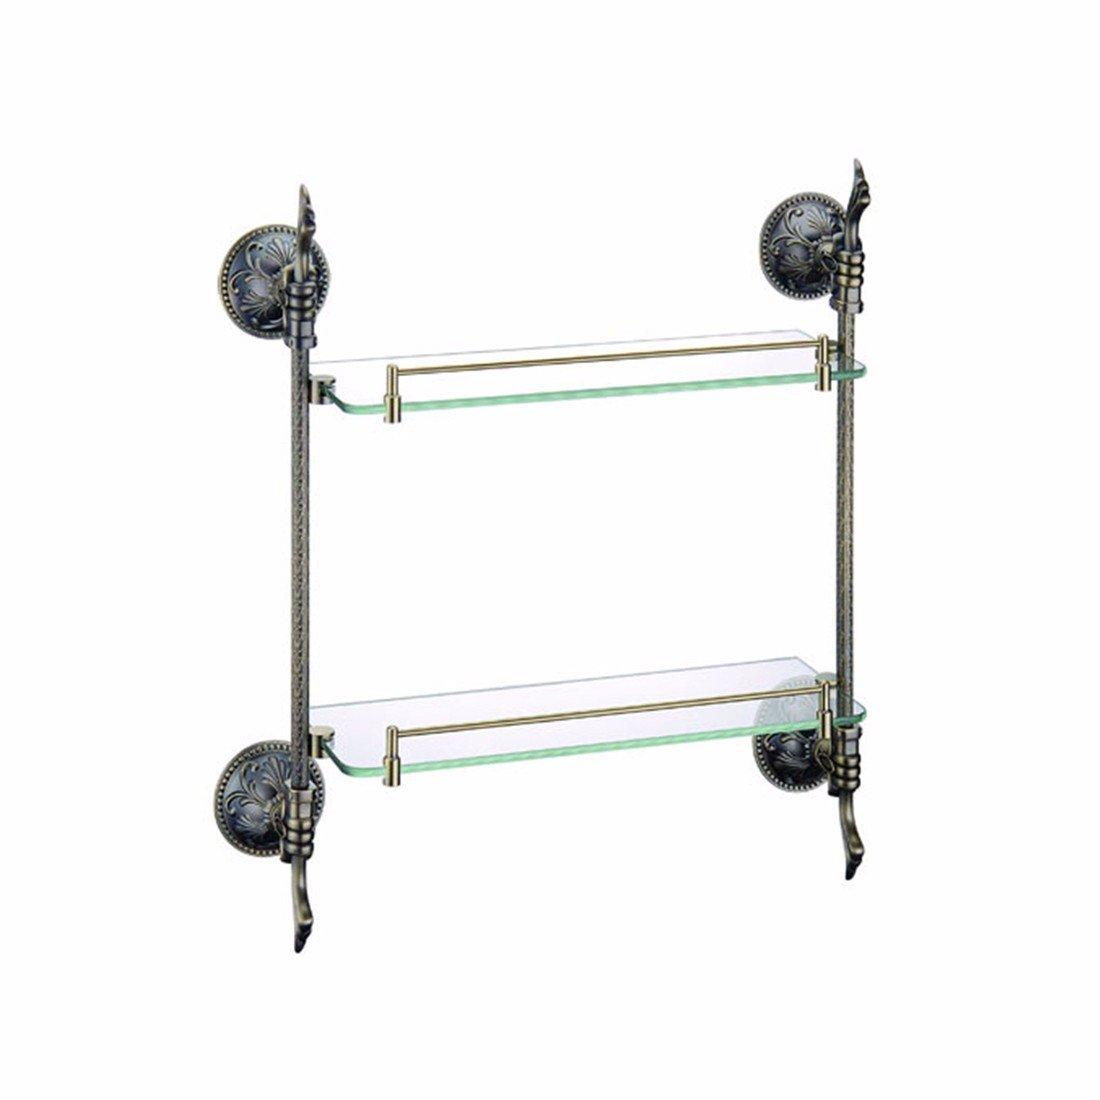 LAONA Carved base, full copper, antique copper bath, pendant set, soap dish, toilet paper frame, single and double pole,Rack 2